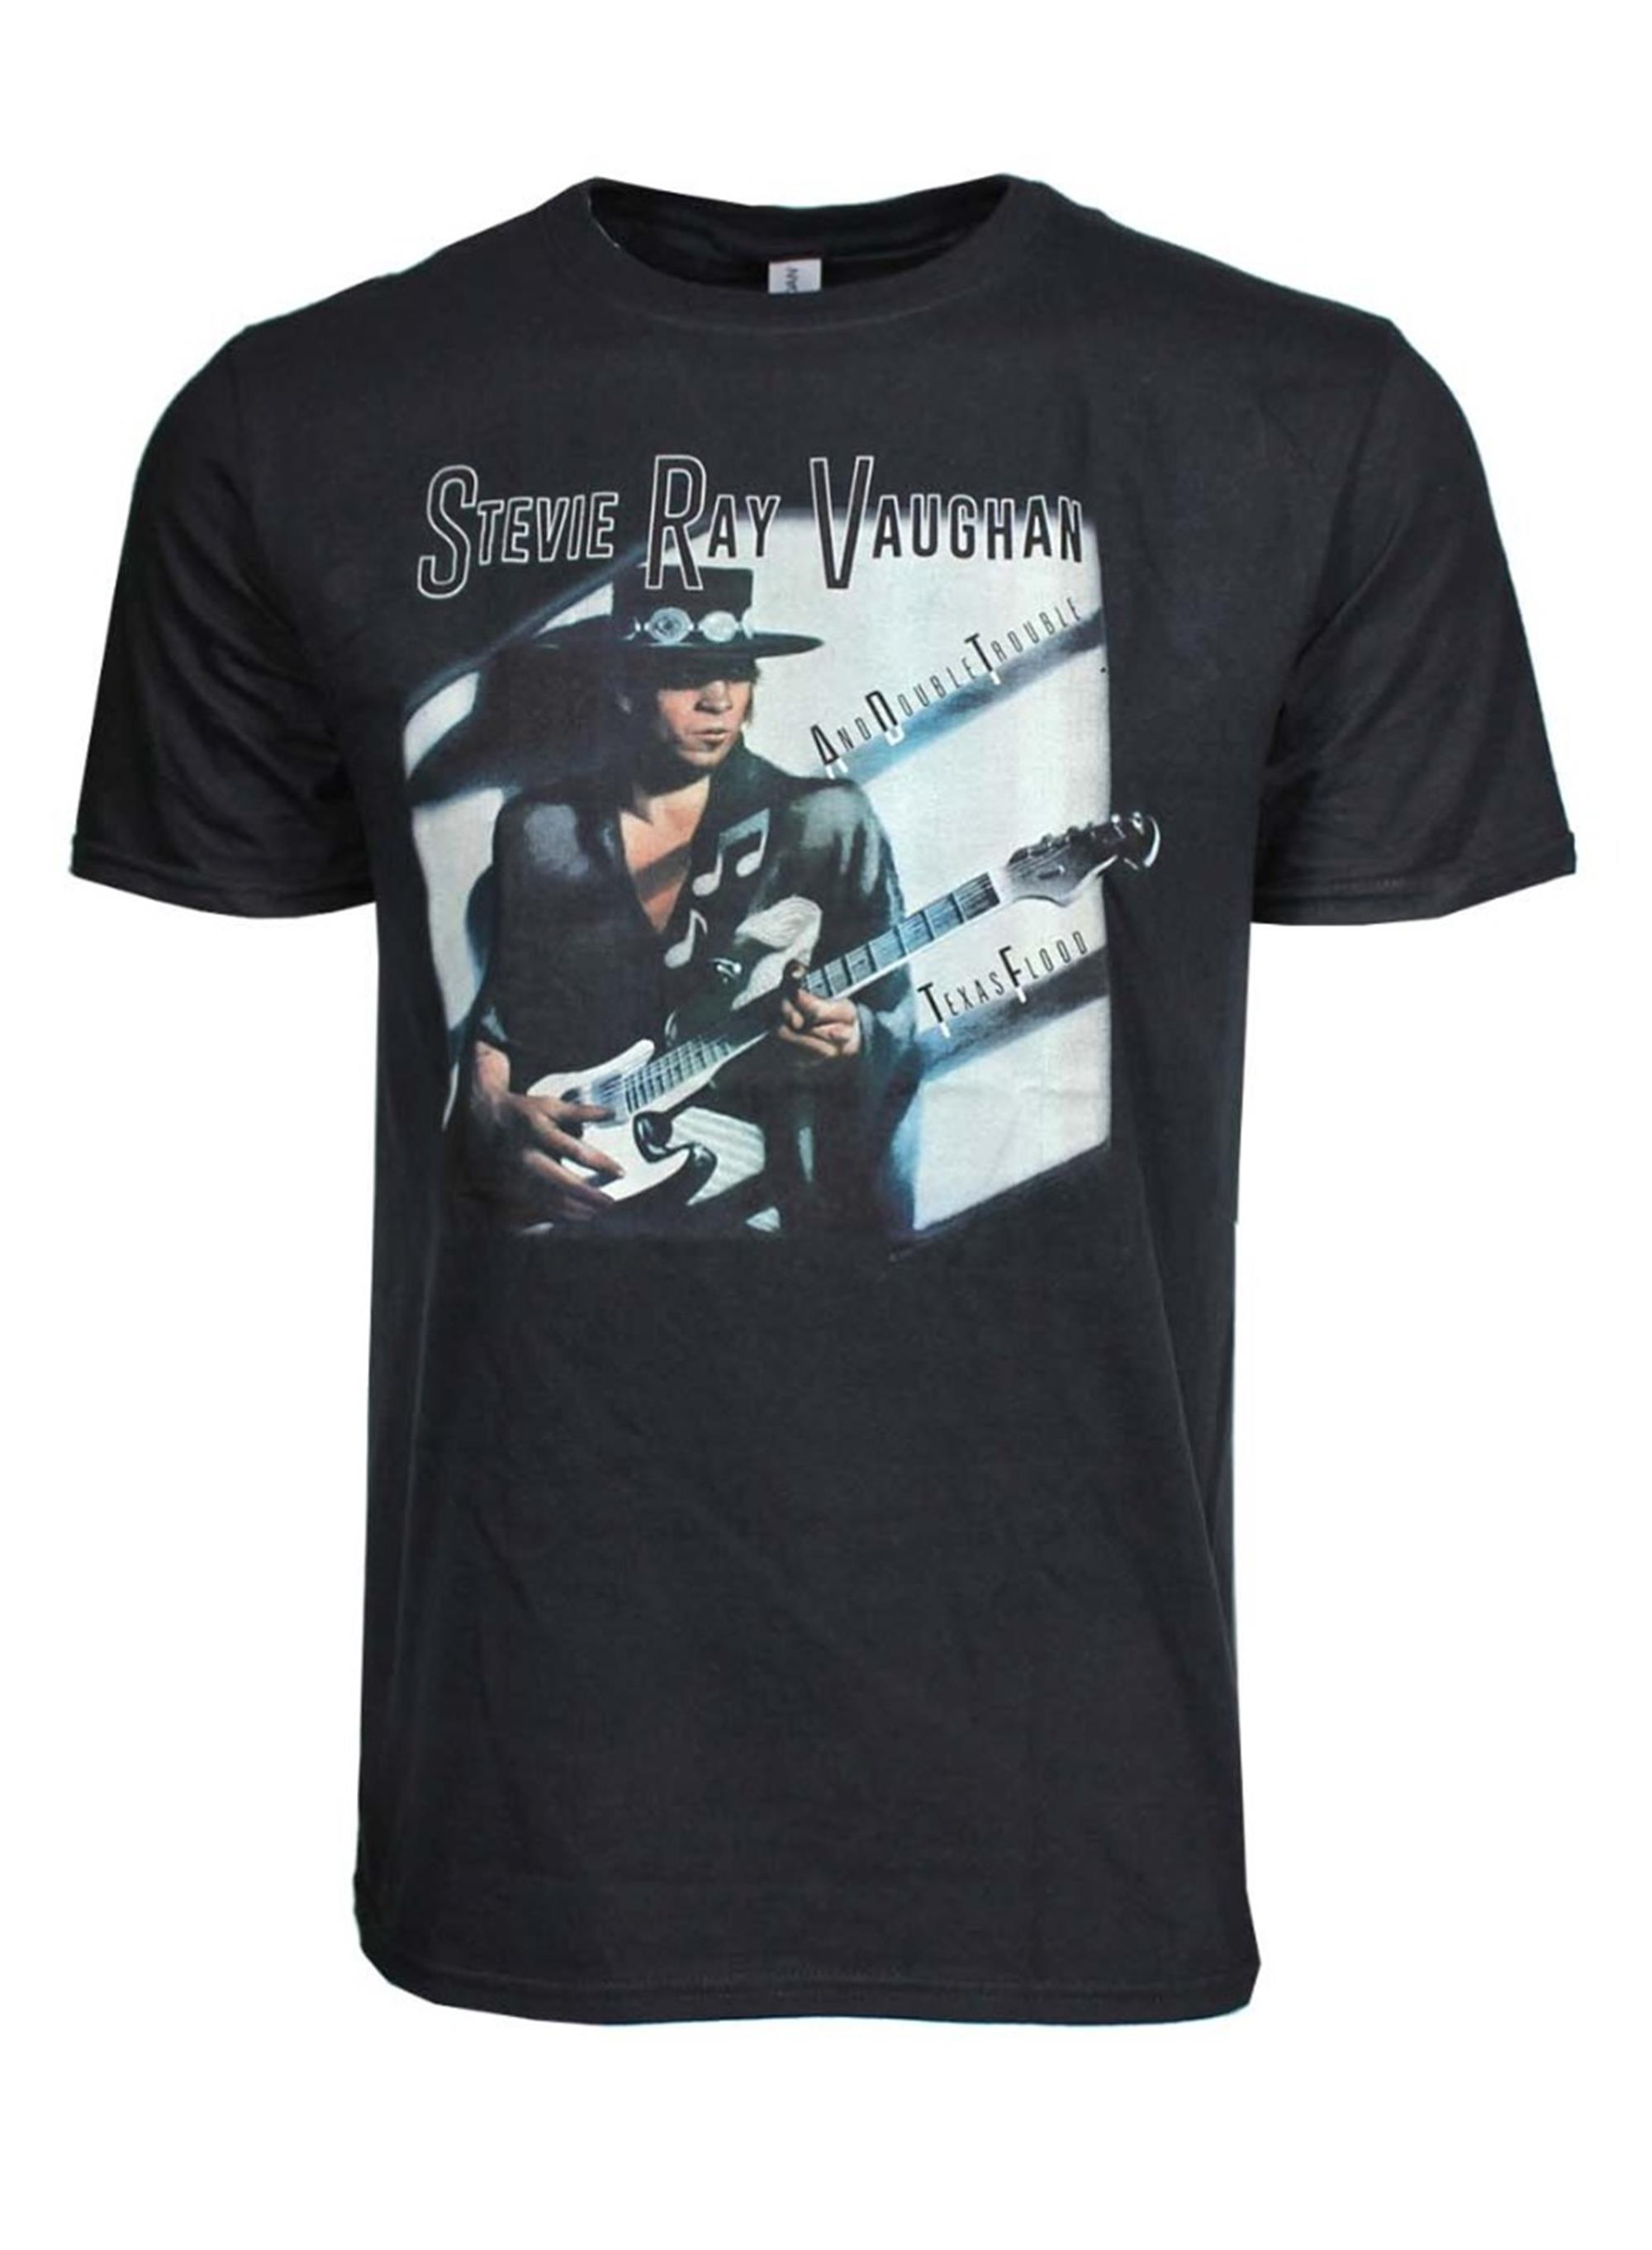 Stevie Ray Vaughan Texas Flood T-Shirt